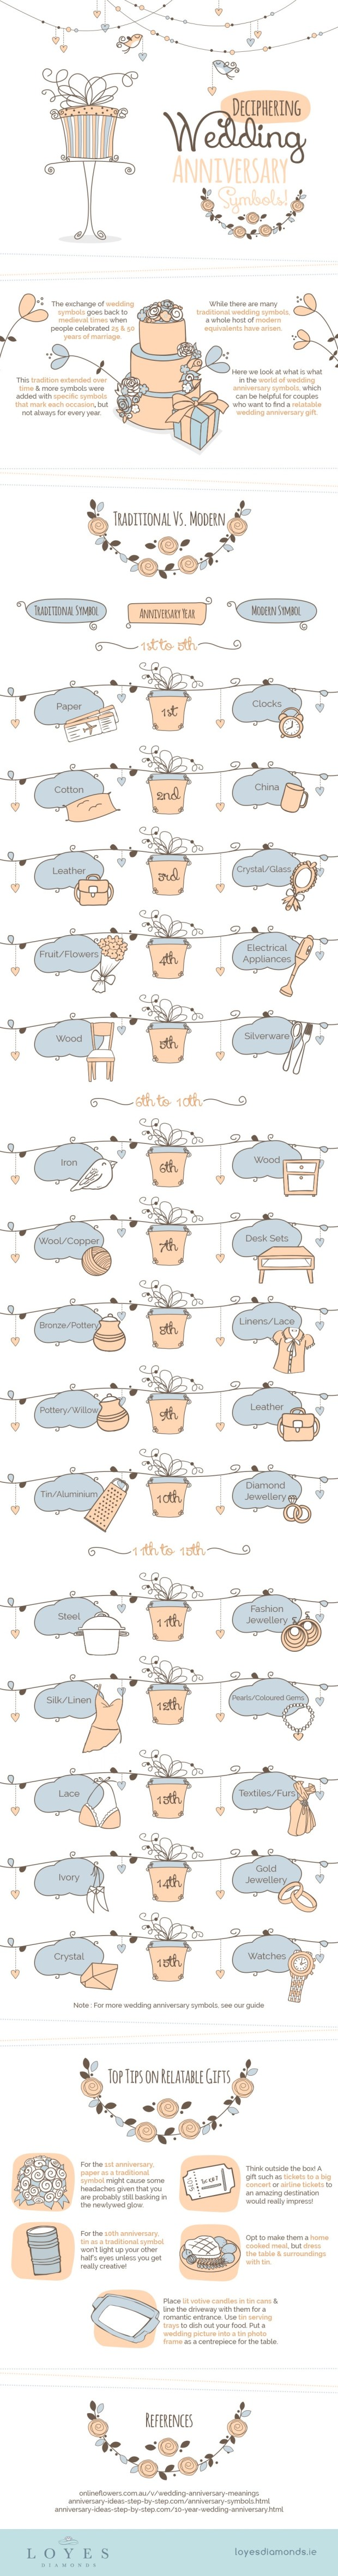 deciphering-wedding-symbols-ig-1